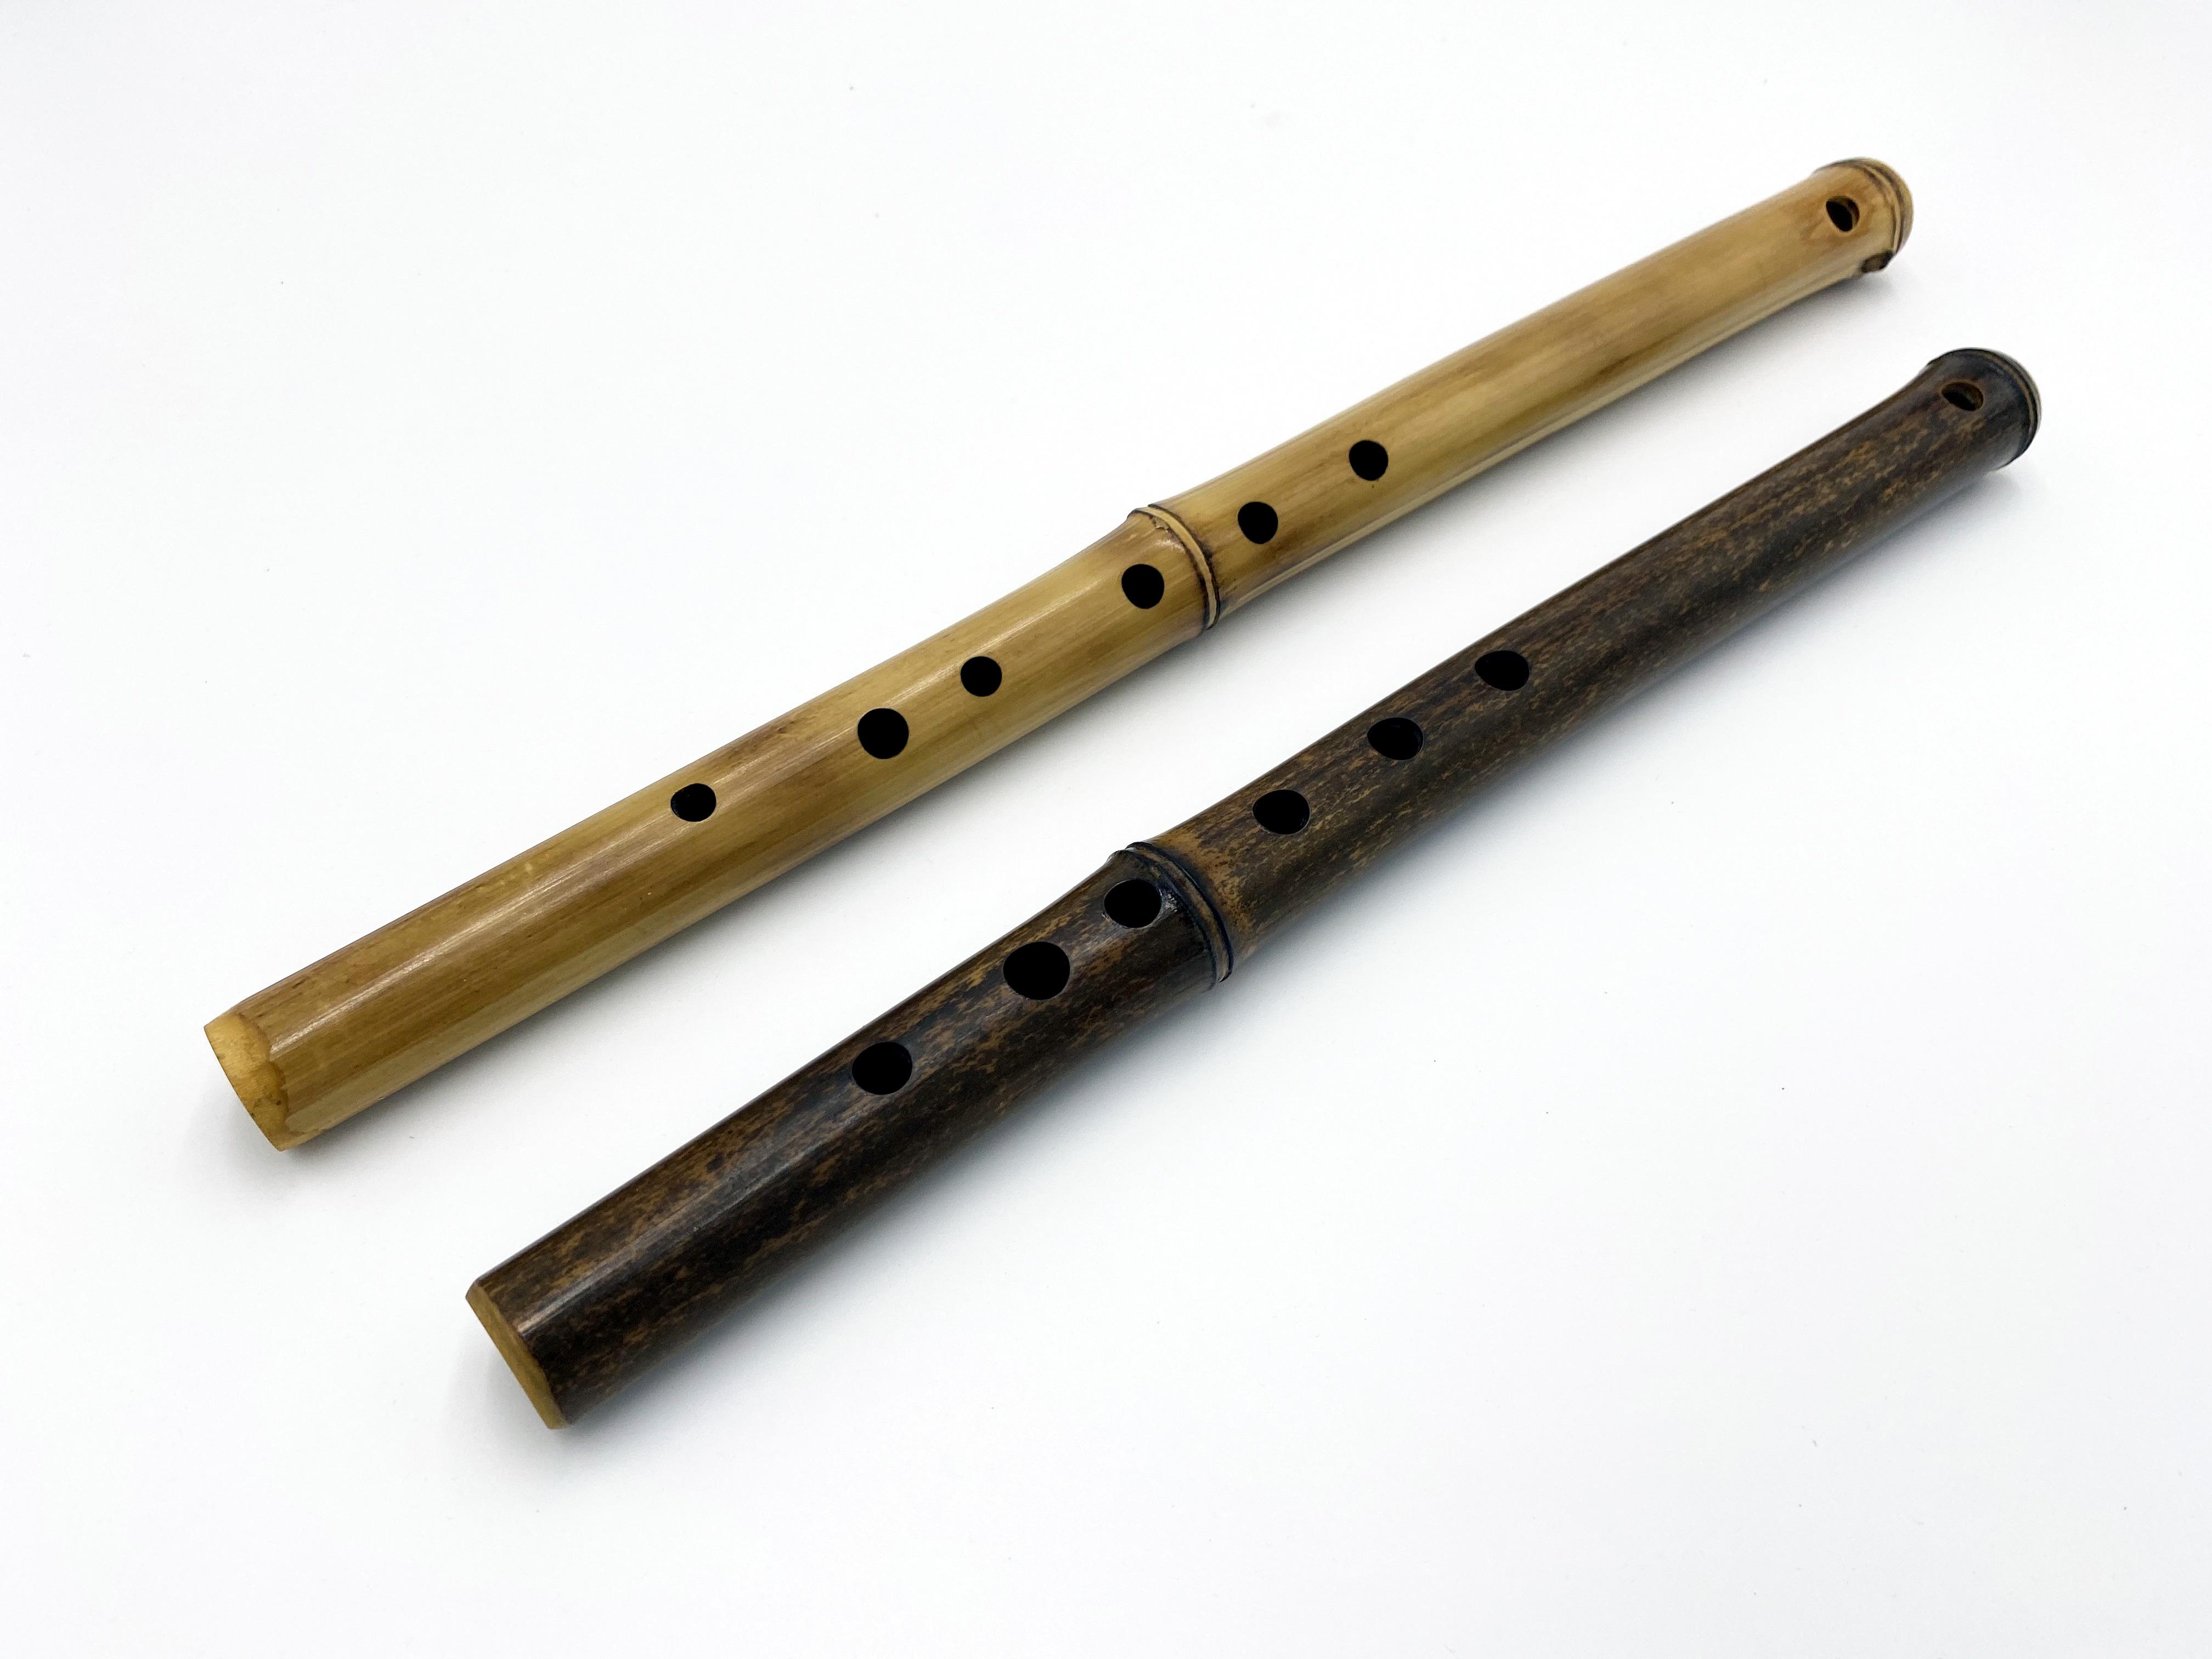 major-scale-2-flutes-edit-2.jpg